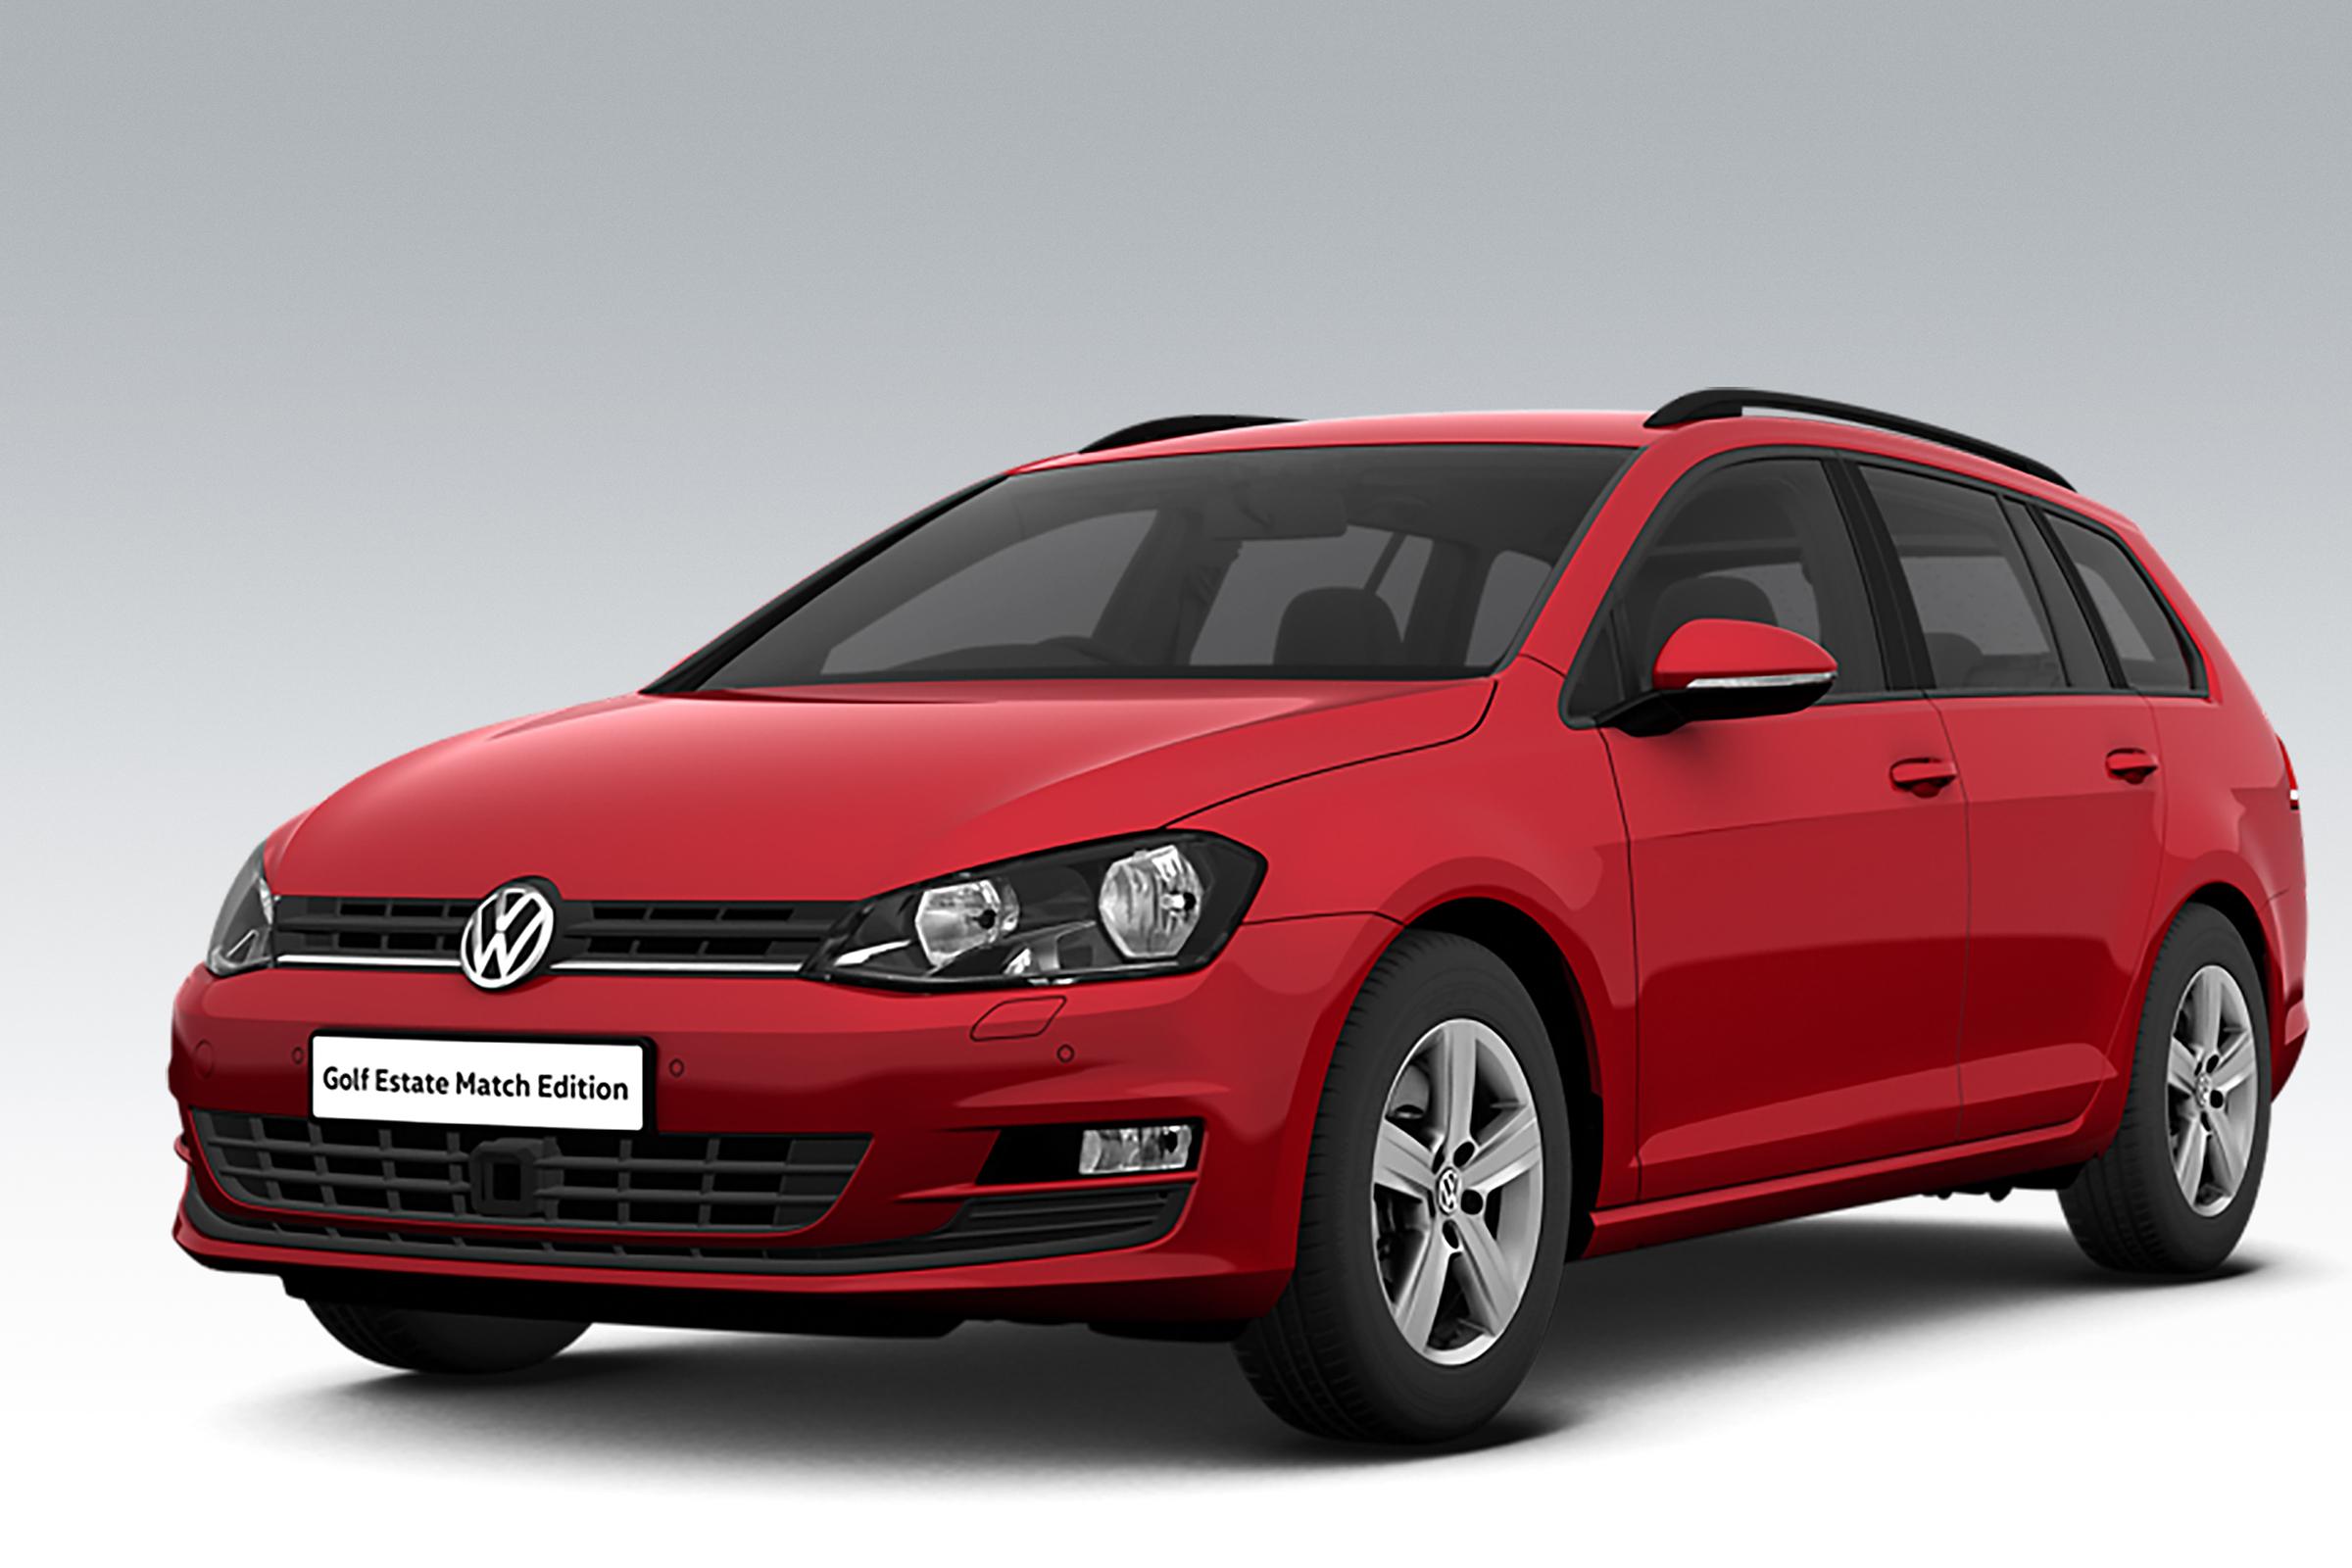 New Volkswagen Golf Estate Match Edition Announced